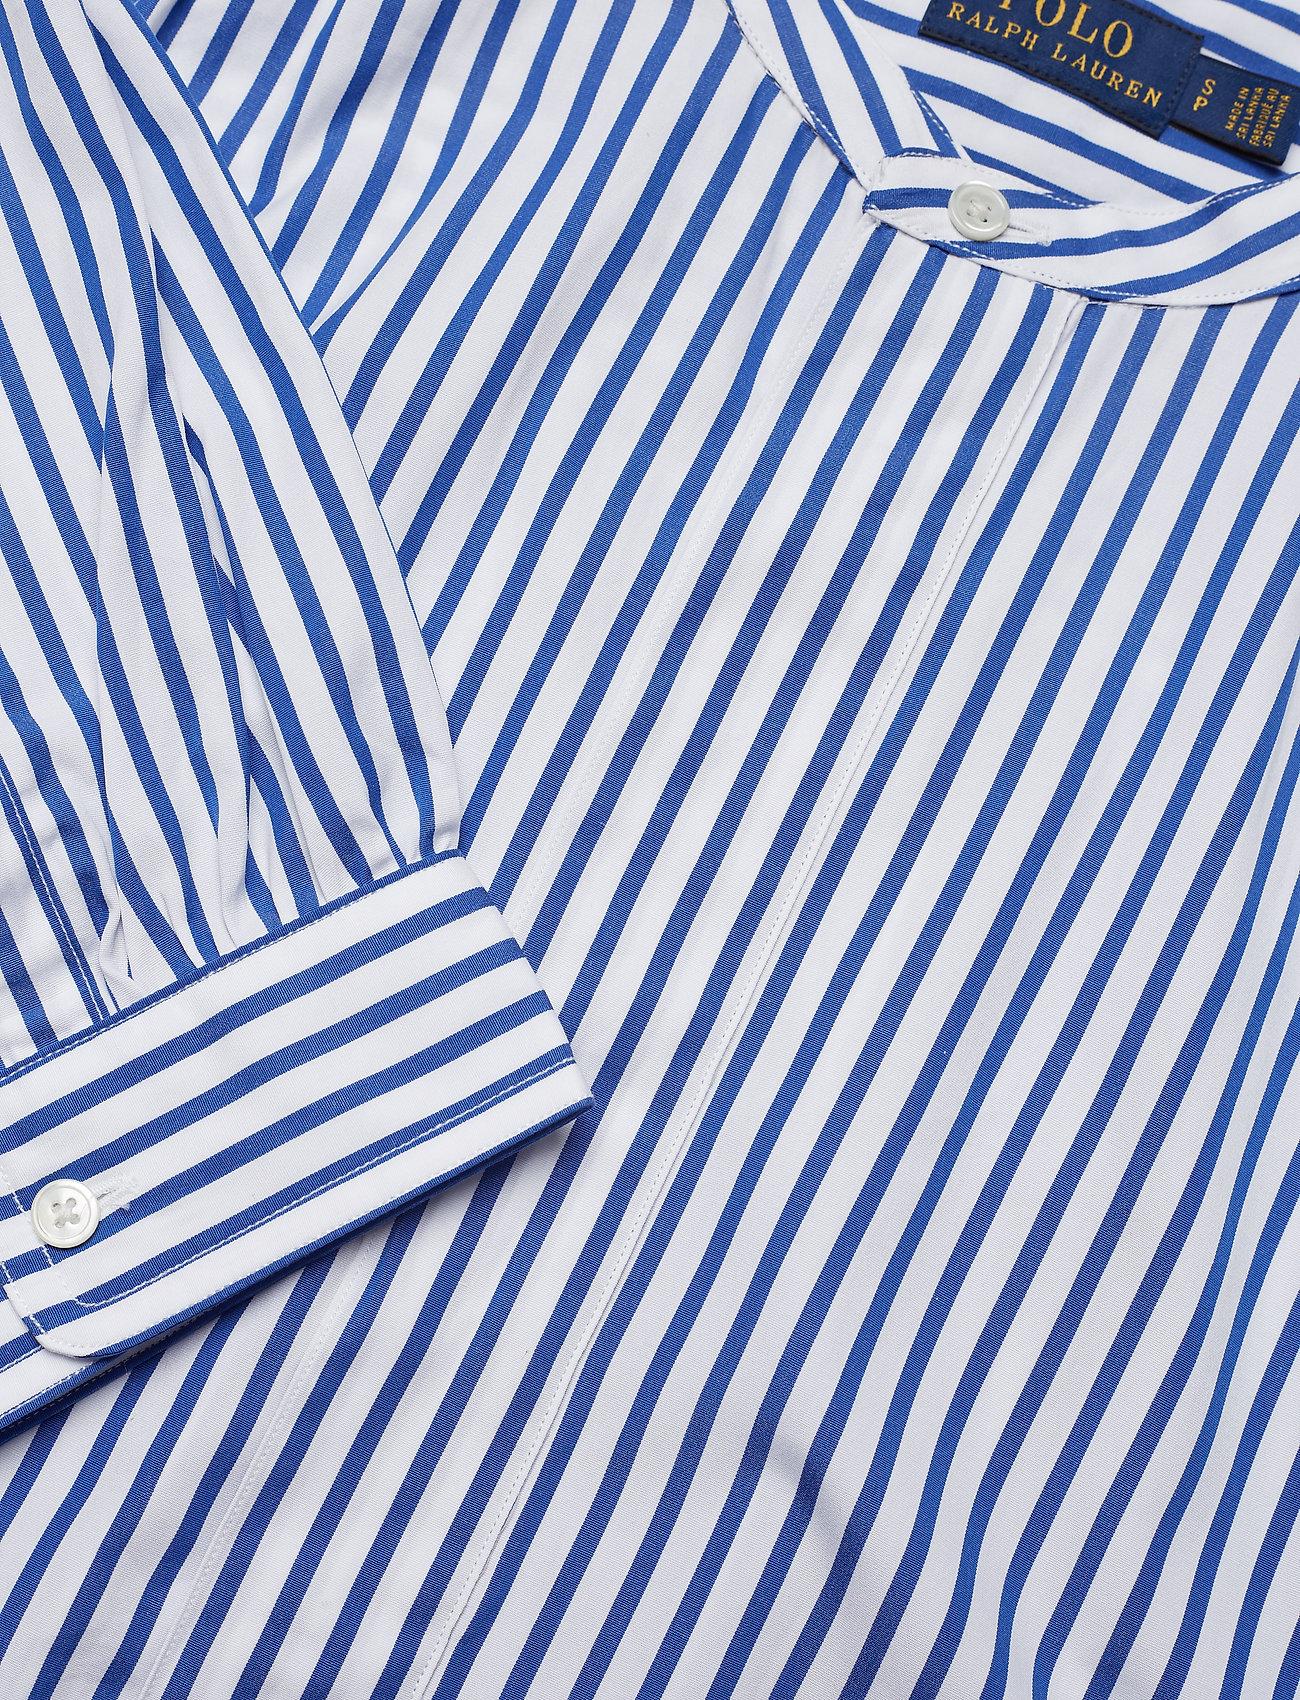 Striped Cotton Shirt (814 Blue/white) (479.60 kr) - Polo Ralph Lauren